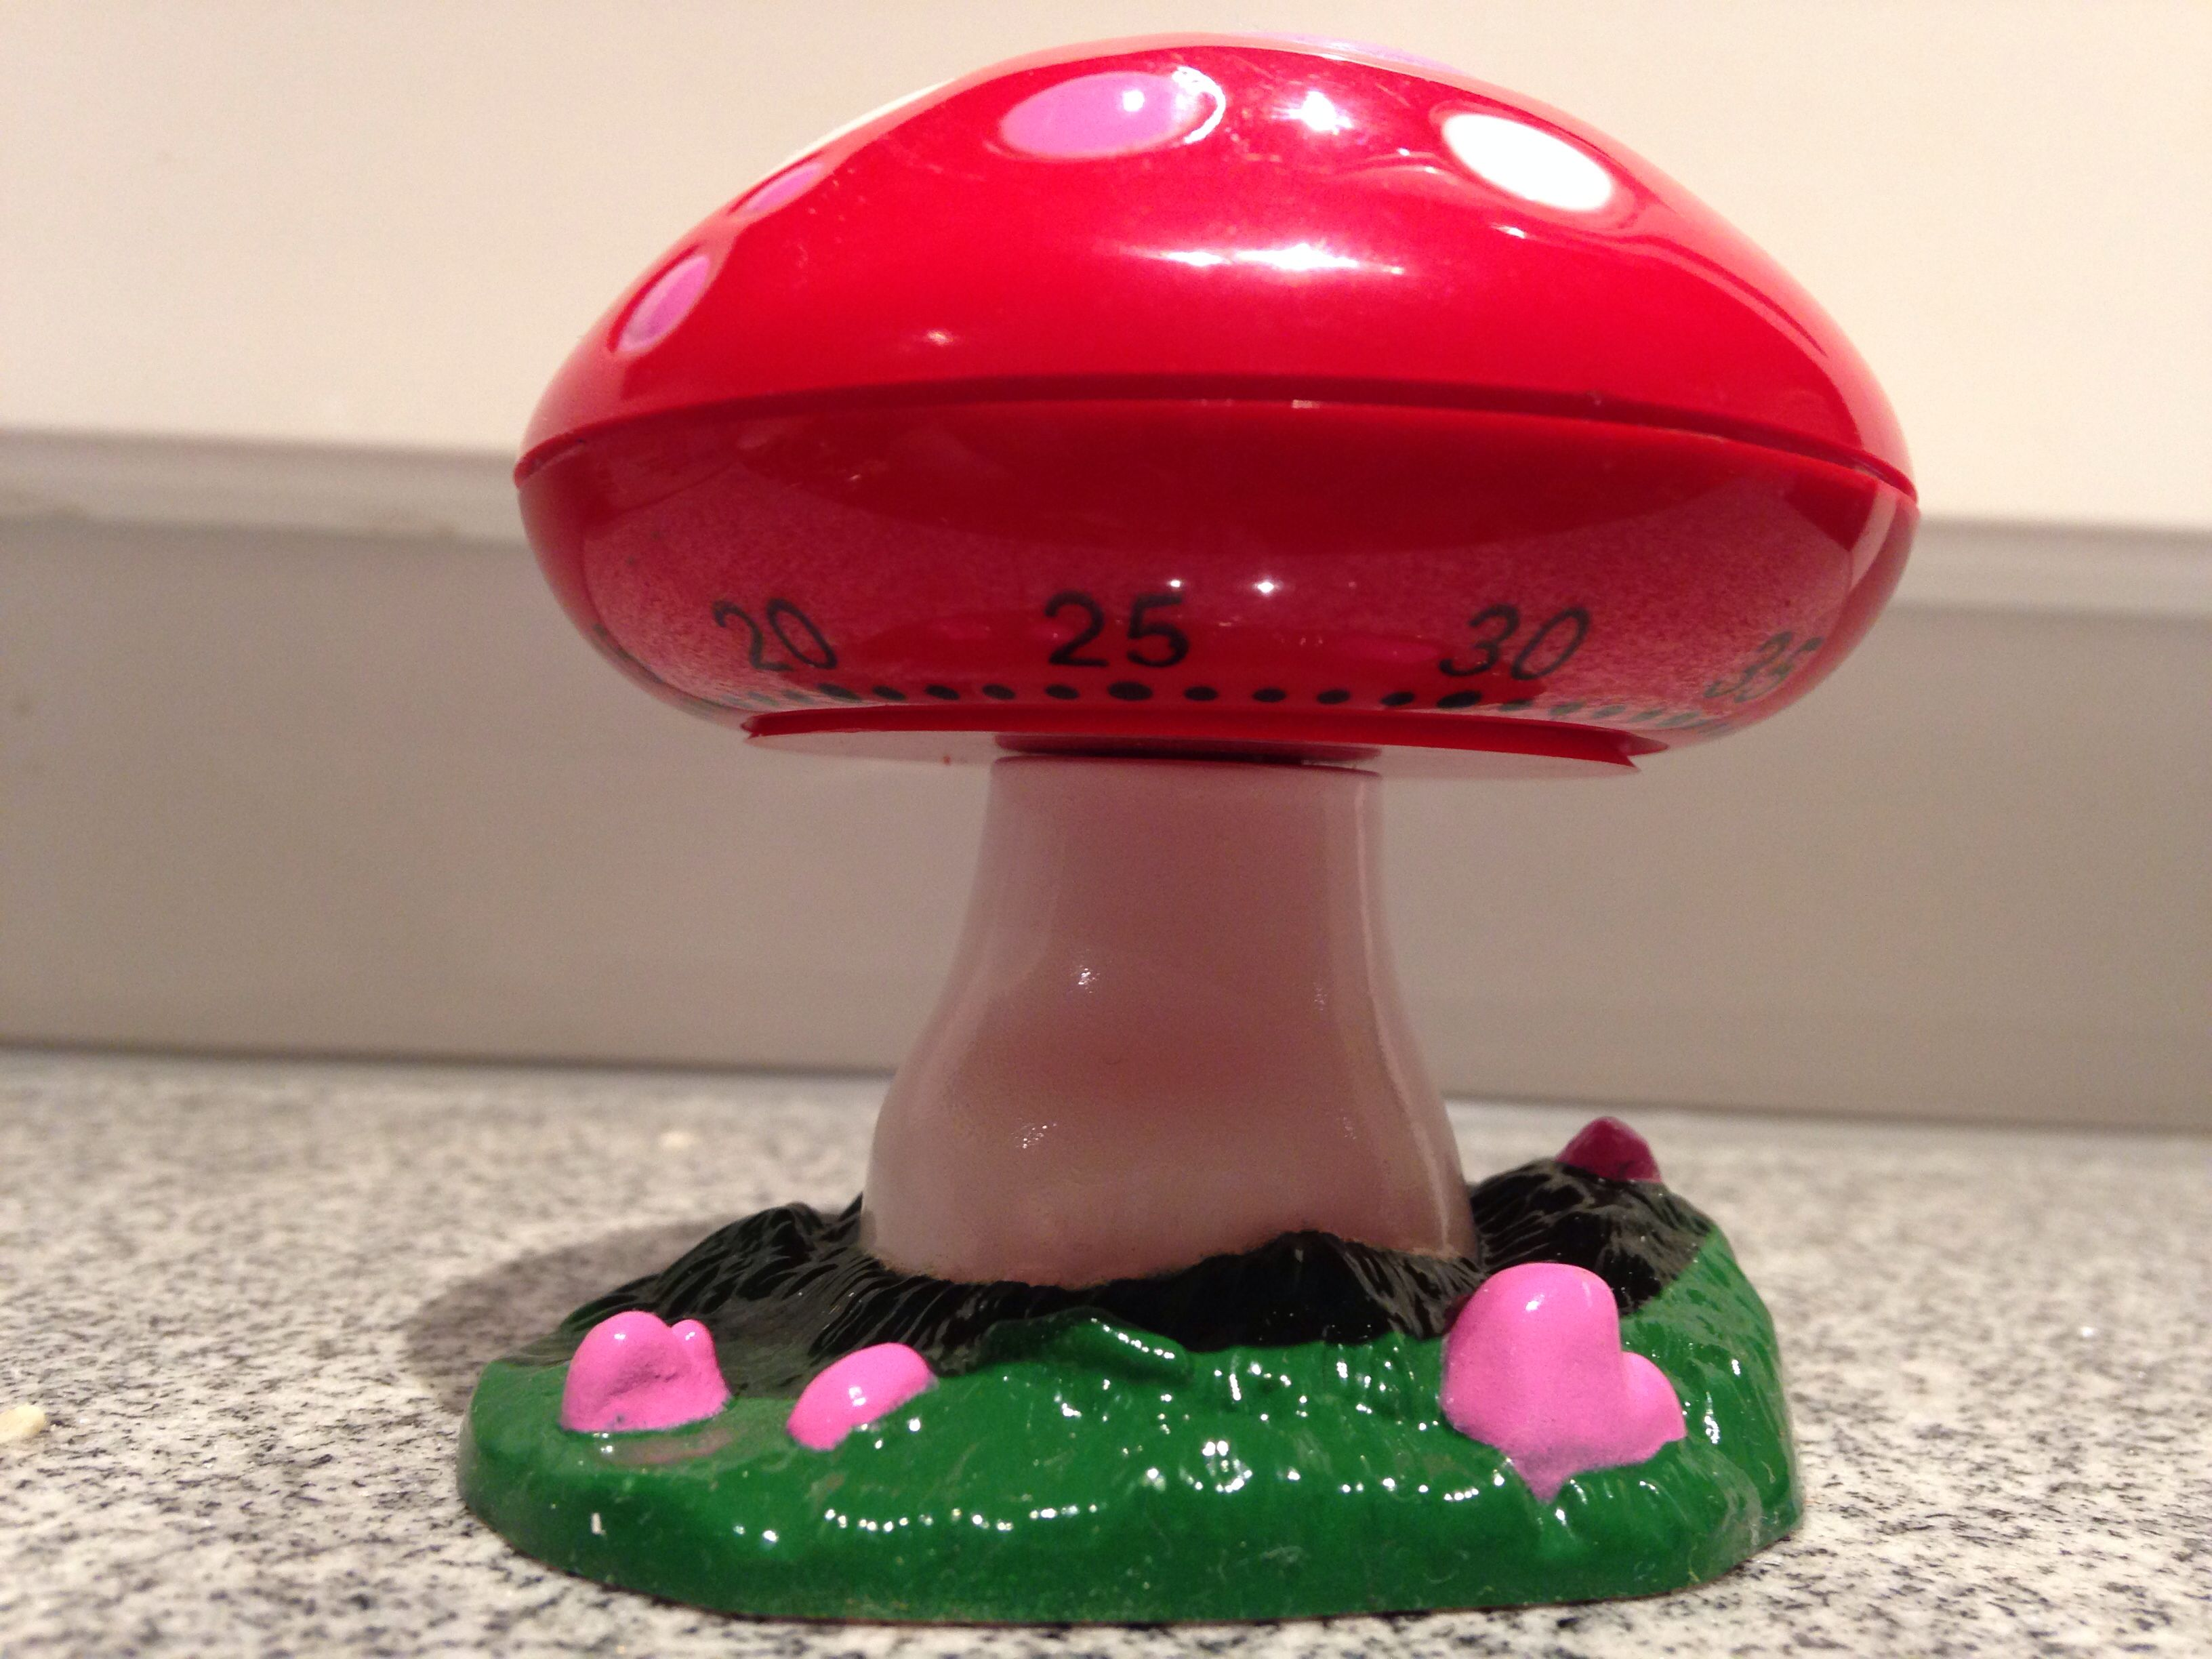 Fairytale mushroom kitchen timer. Yes, I bought it!